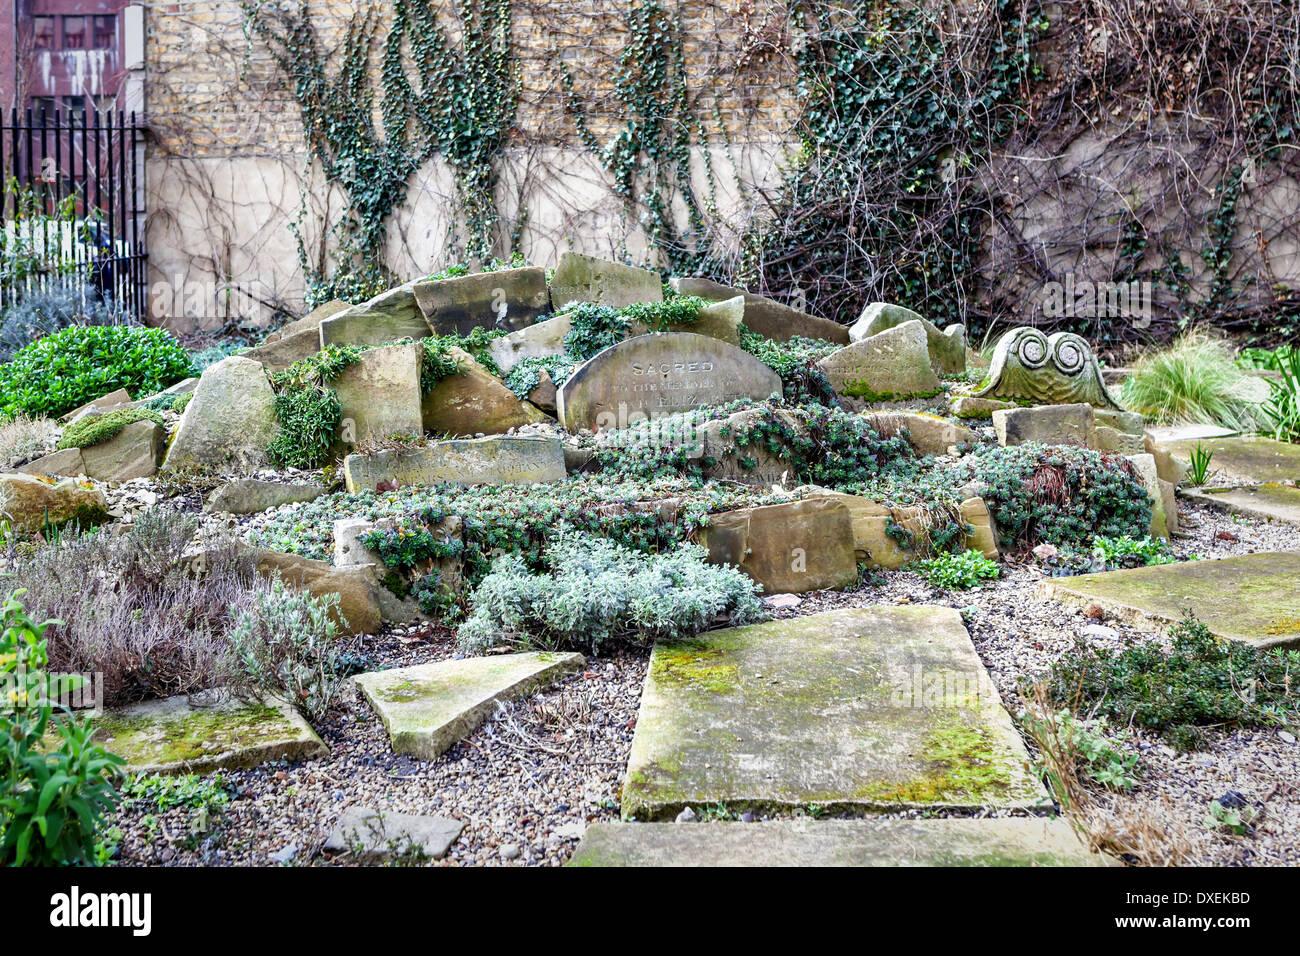 Captivating Alpine Garden Constructed Using Broken Old Tombstones In St. Georgeu0027s  Graveyard Gardens  St George The Martyr, Southwark, London